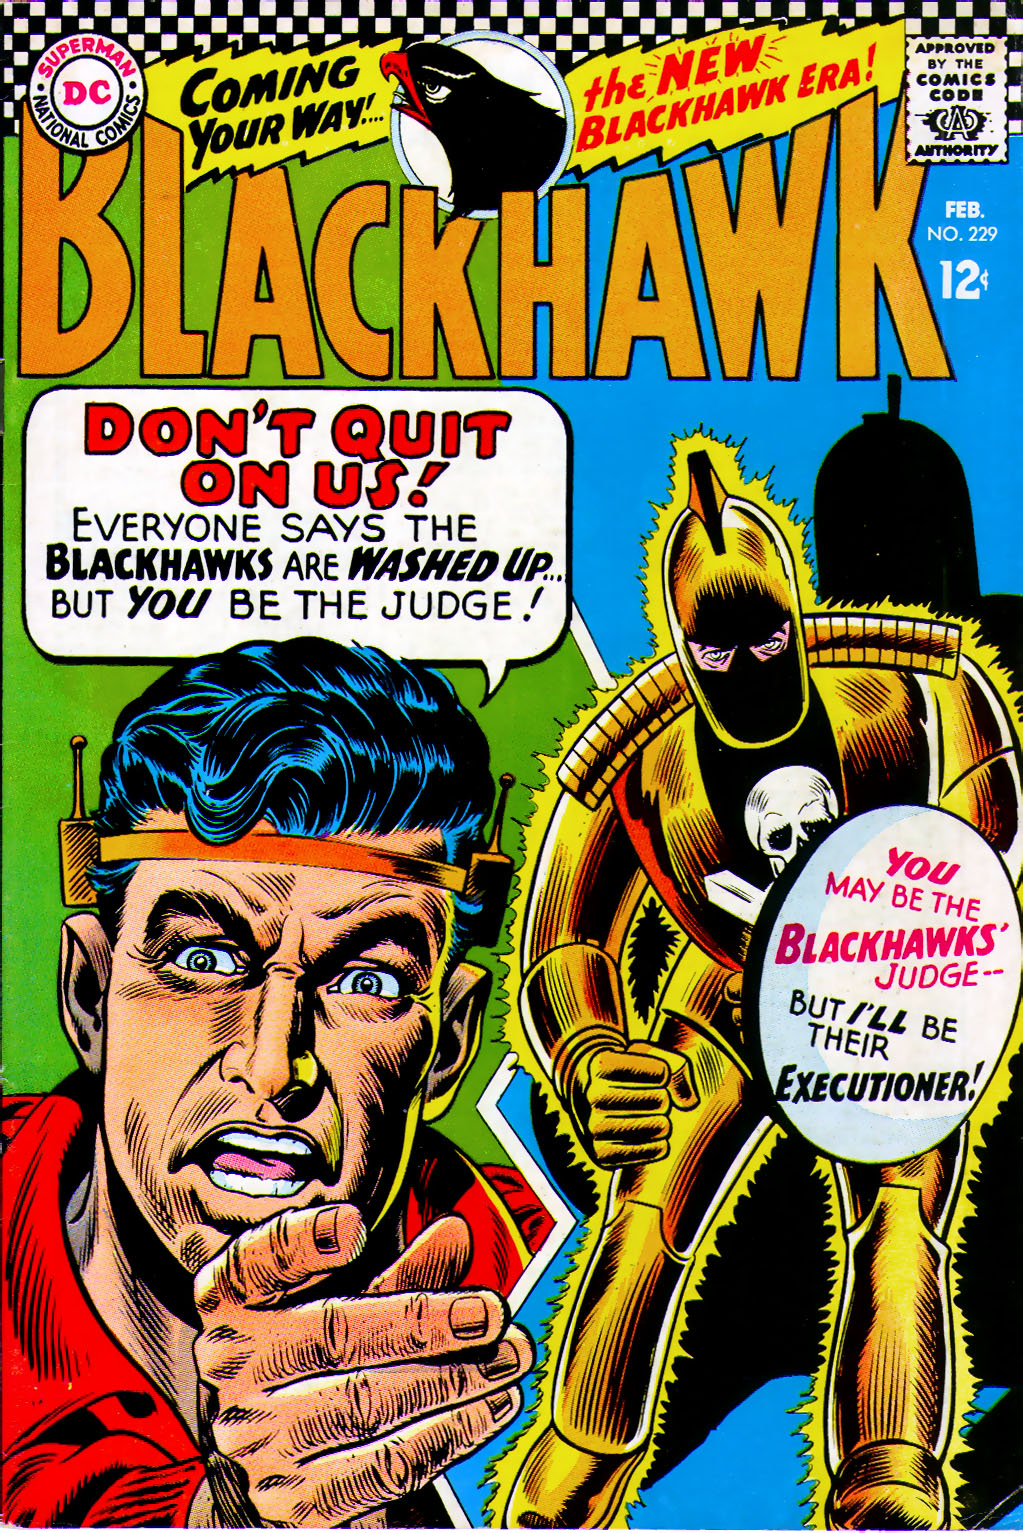 Blackhawk (1957) 229 Page 1